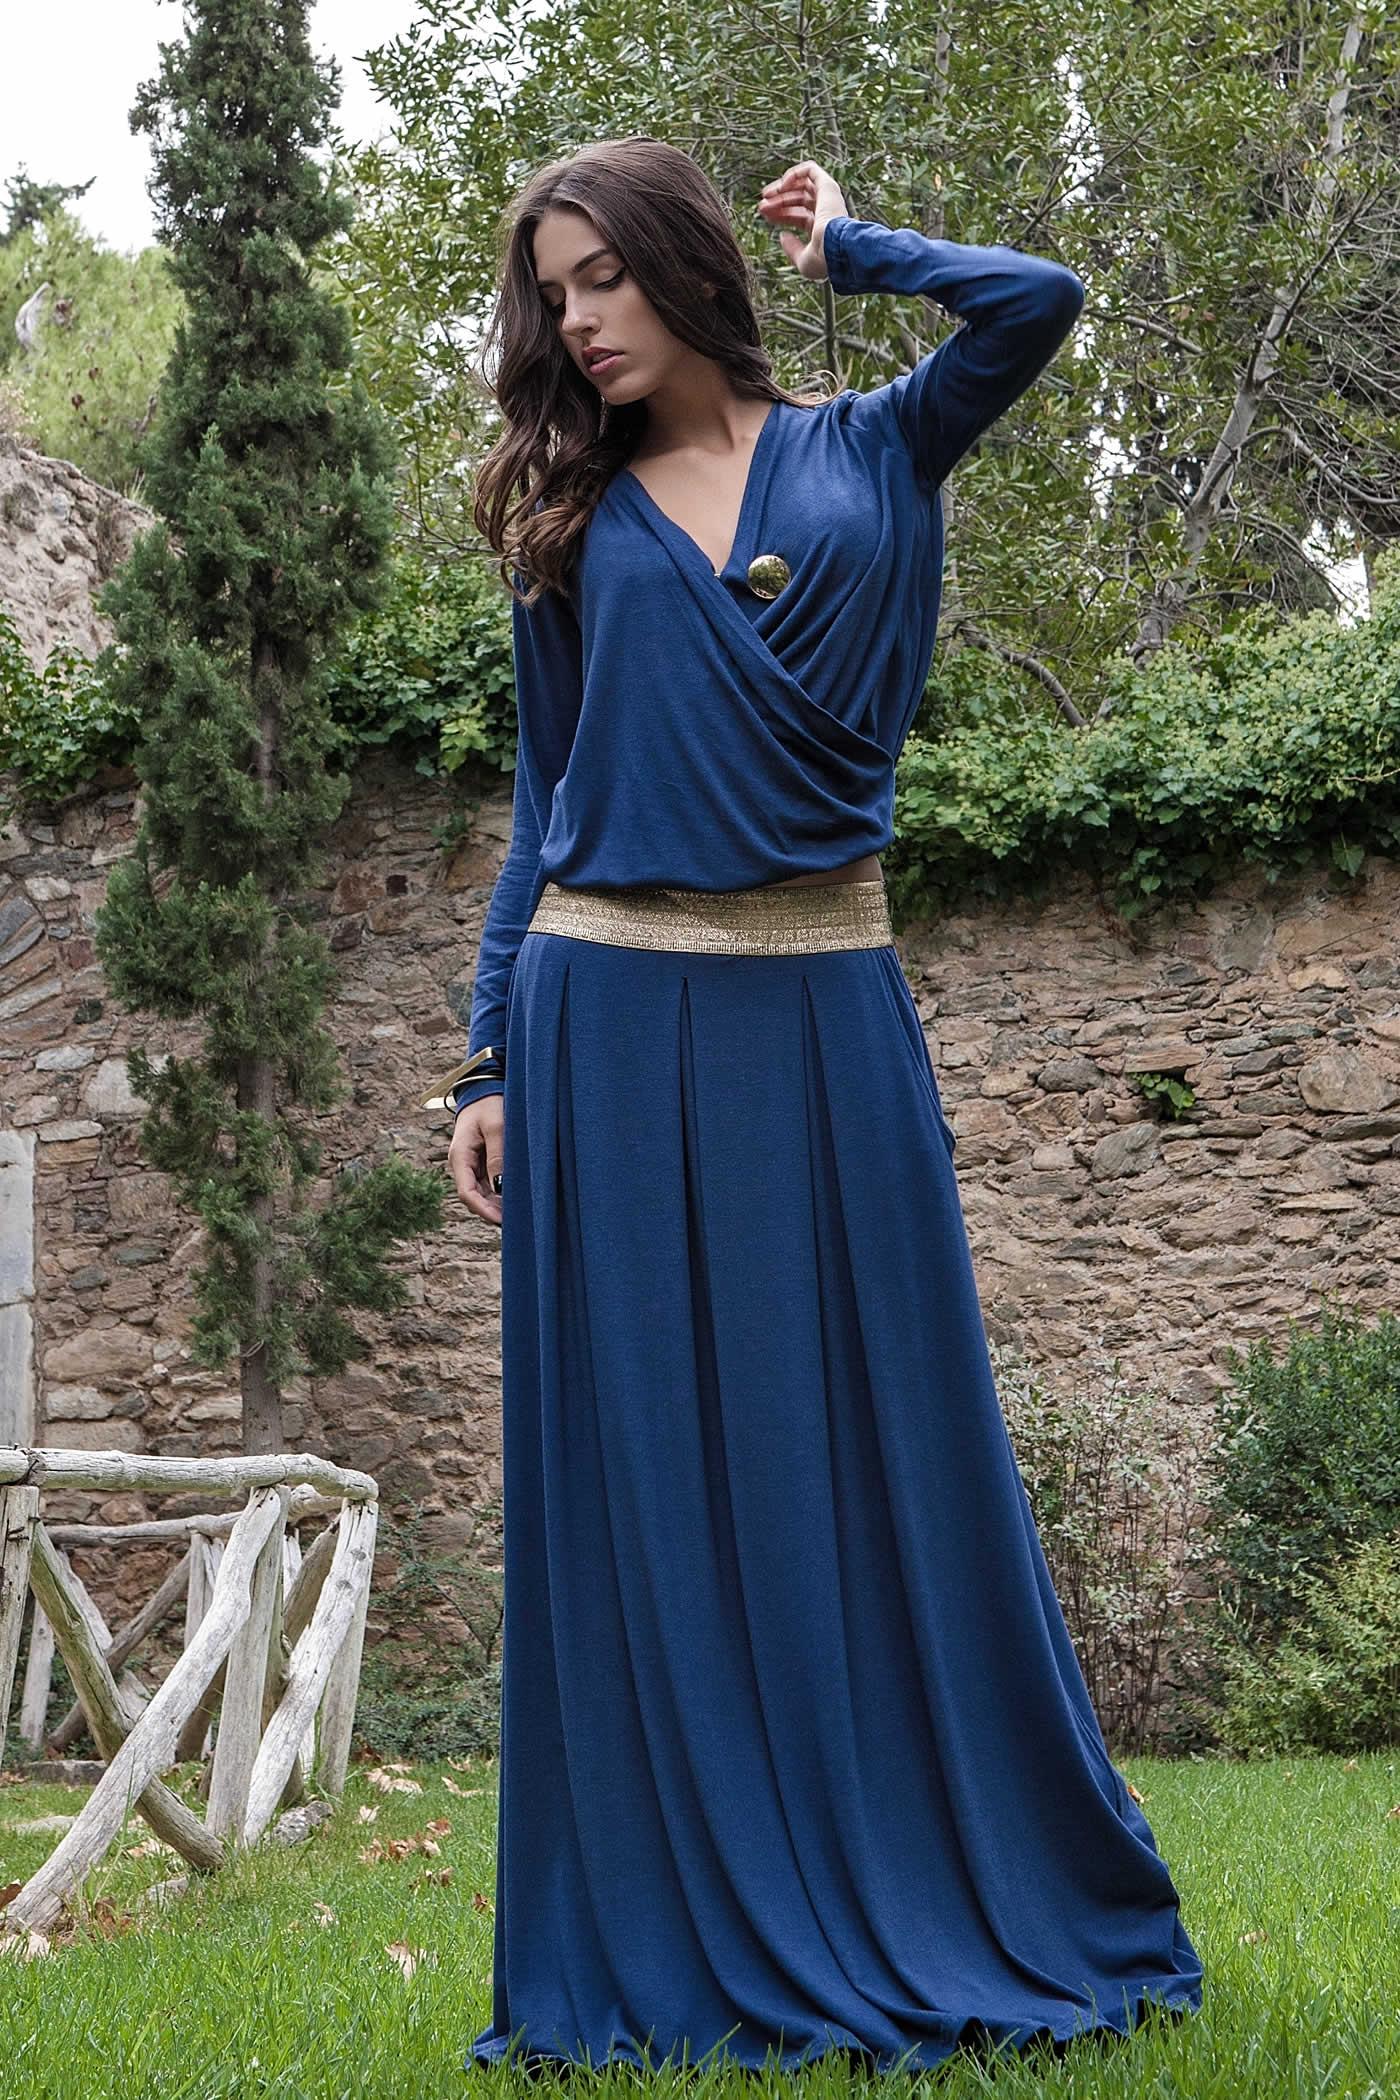 0579c587312 Γυναικεία πλεκτή μπλούζα κρουαζέ μαζί με το αξεσουάρ, ξεχωριστά η φούστα - Prestige  Fashion